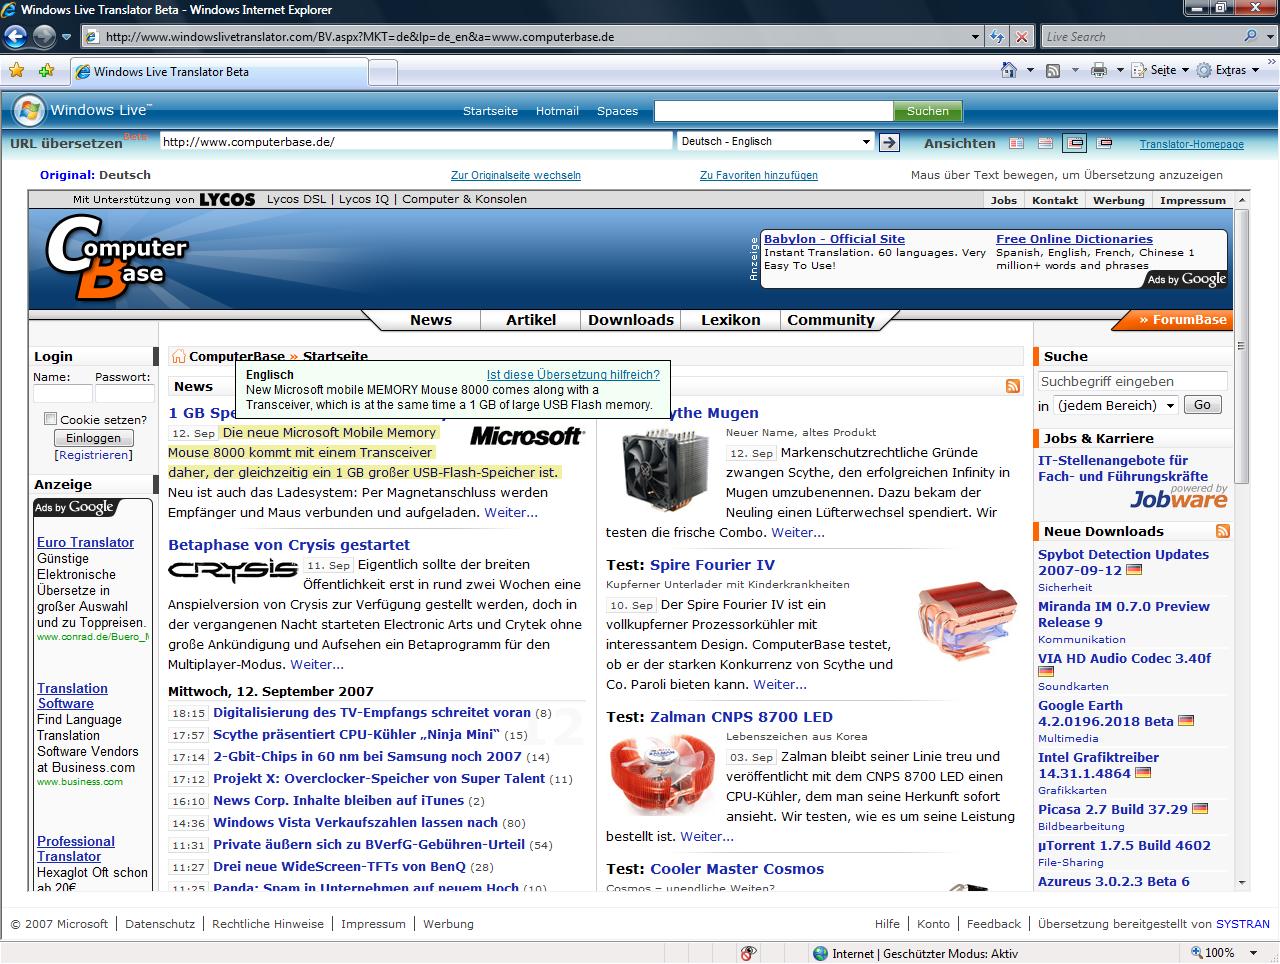 Windows Live Translator mit Hover Übersetzung